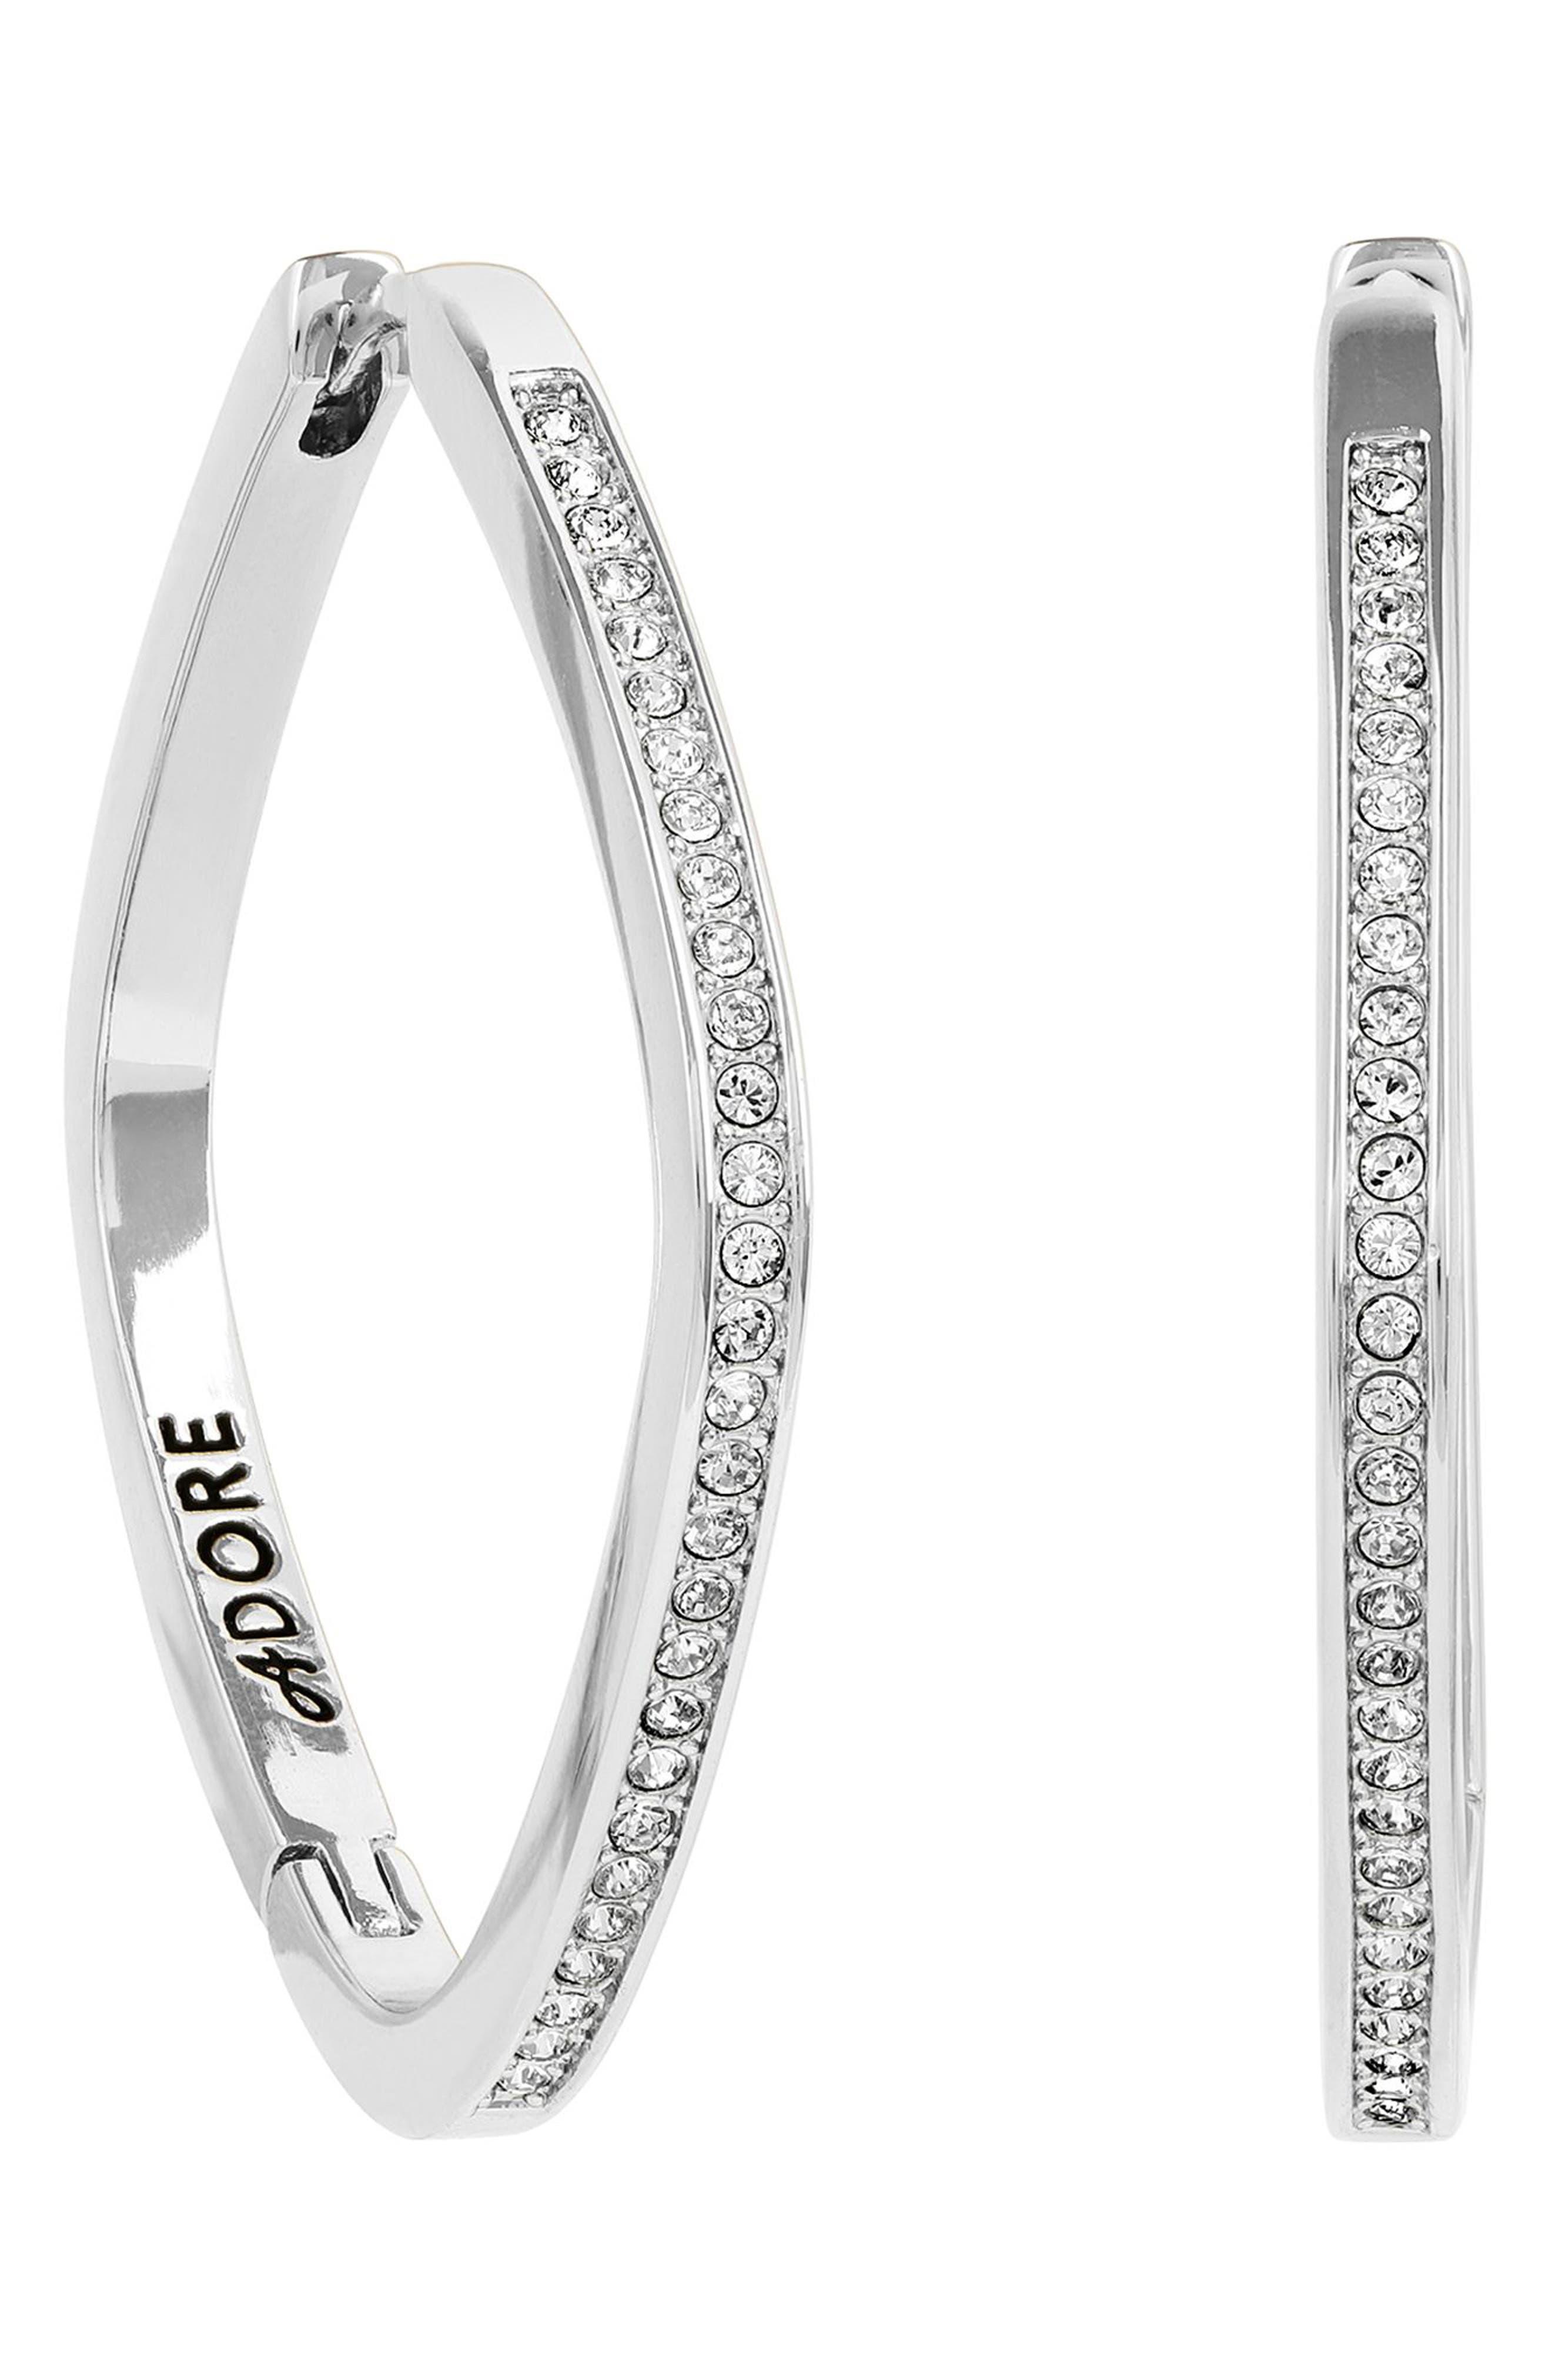 ADORE Soft Square Rhinestone Hoop Earrings in Silver